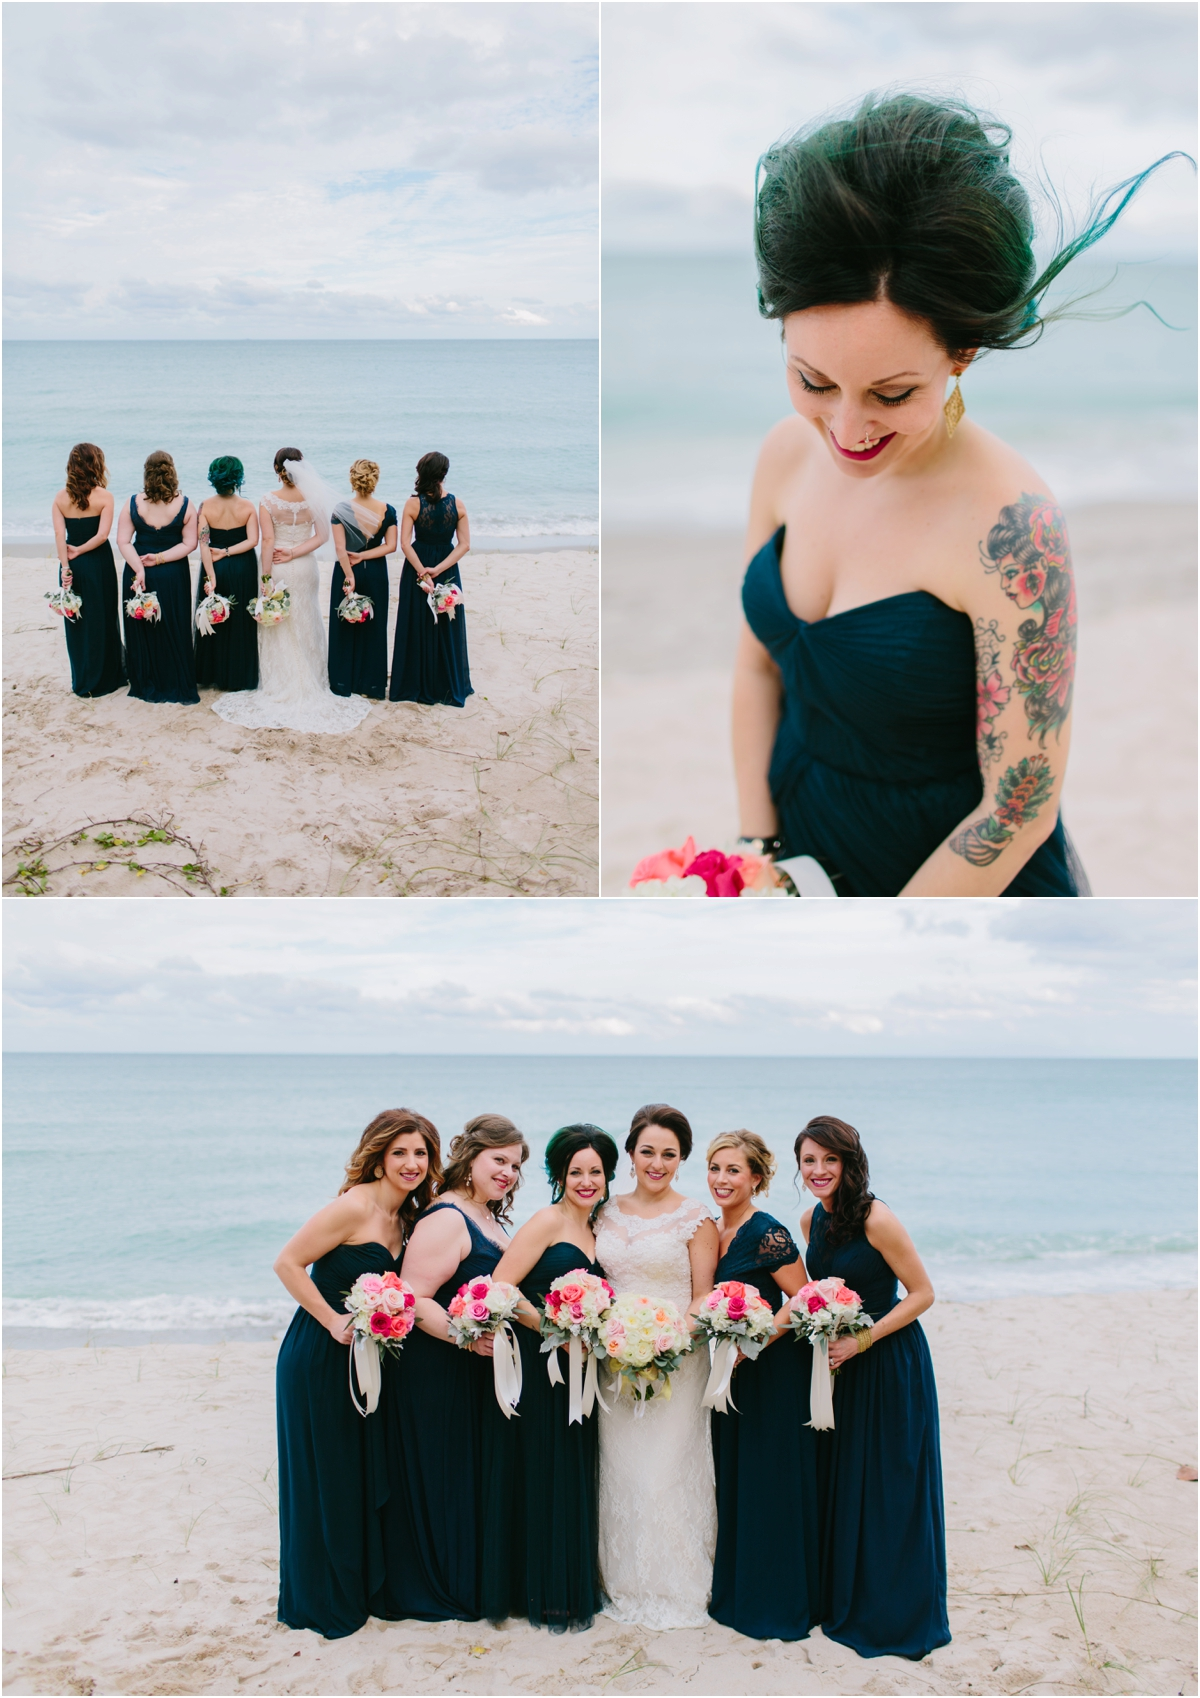 Jupiter-Beach-Resort-Wedding-Venue-photos_0010